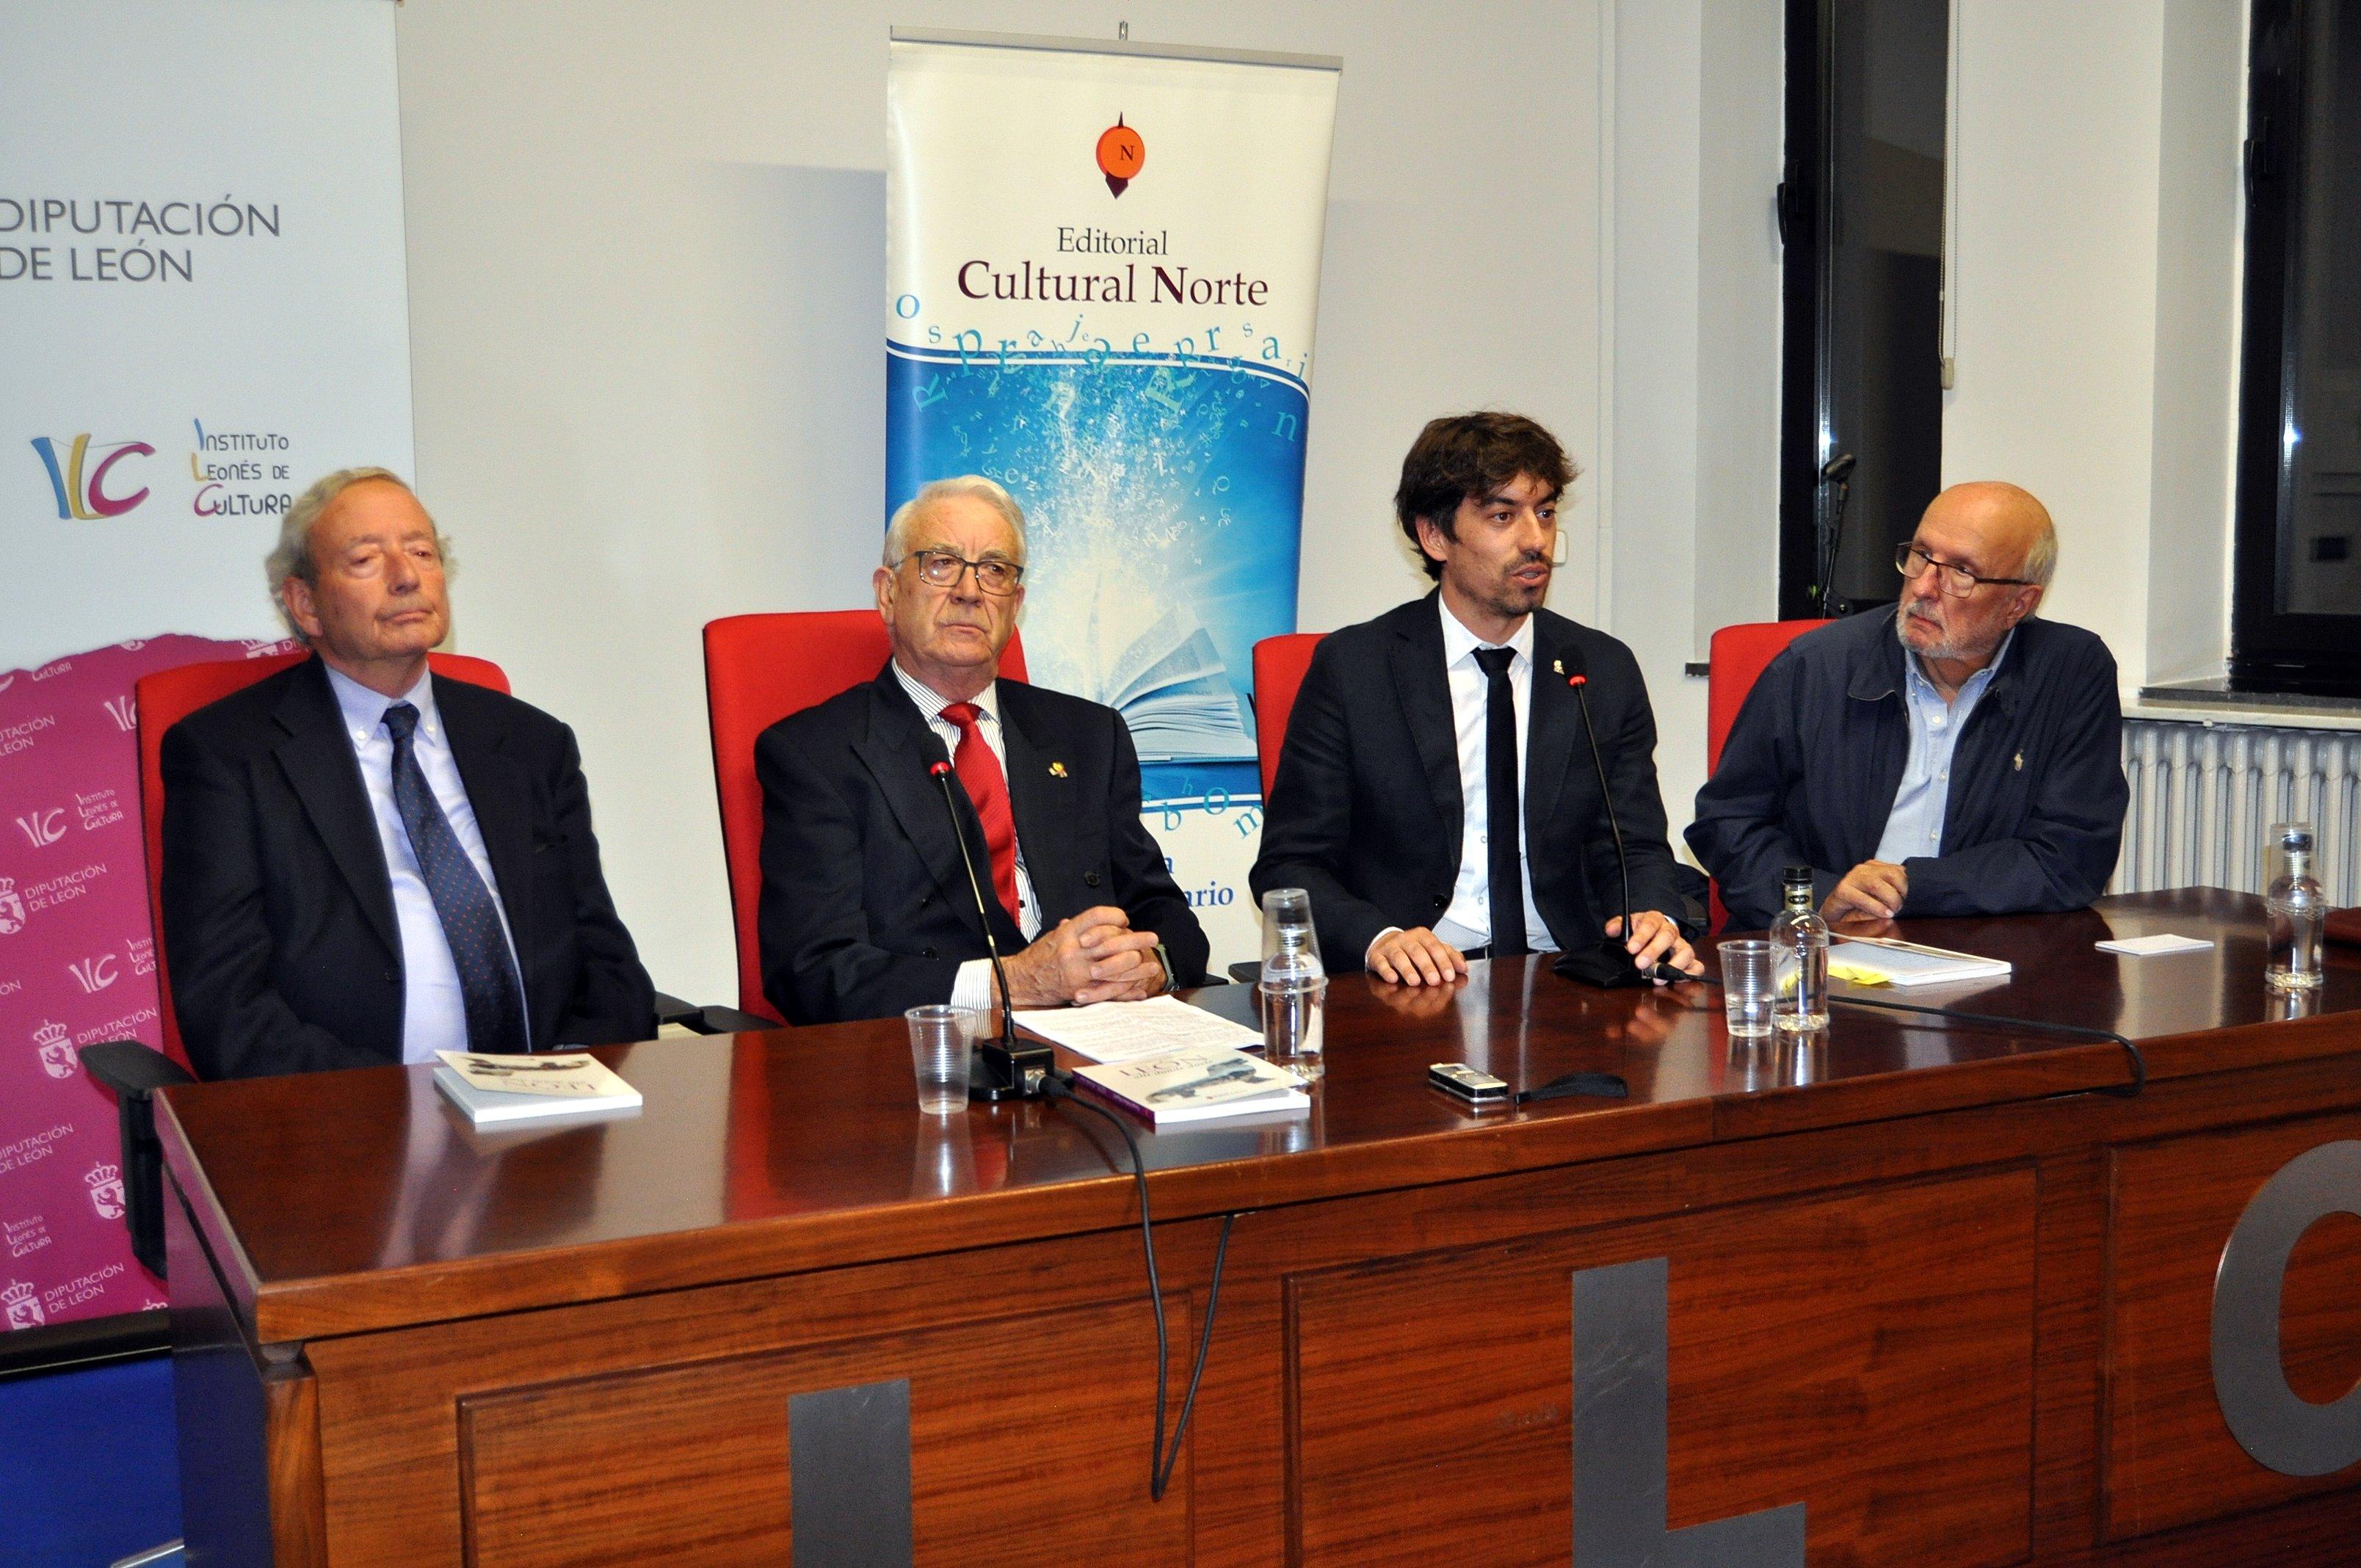 Marcelino Fdez., Ezequiel Pellitero, Pablo González, Roberto Escudero.